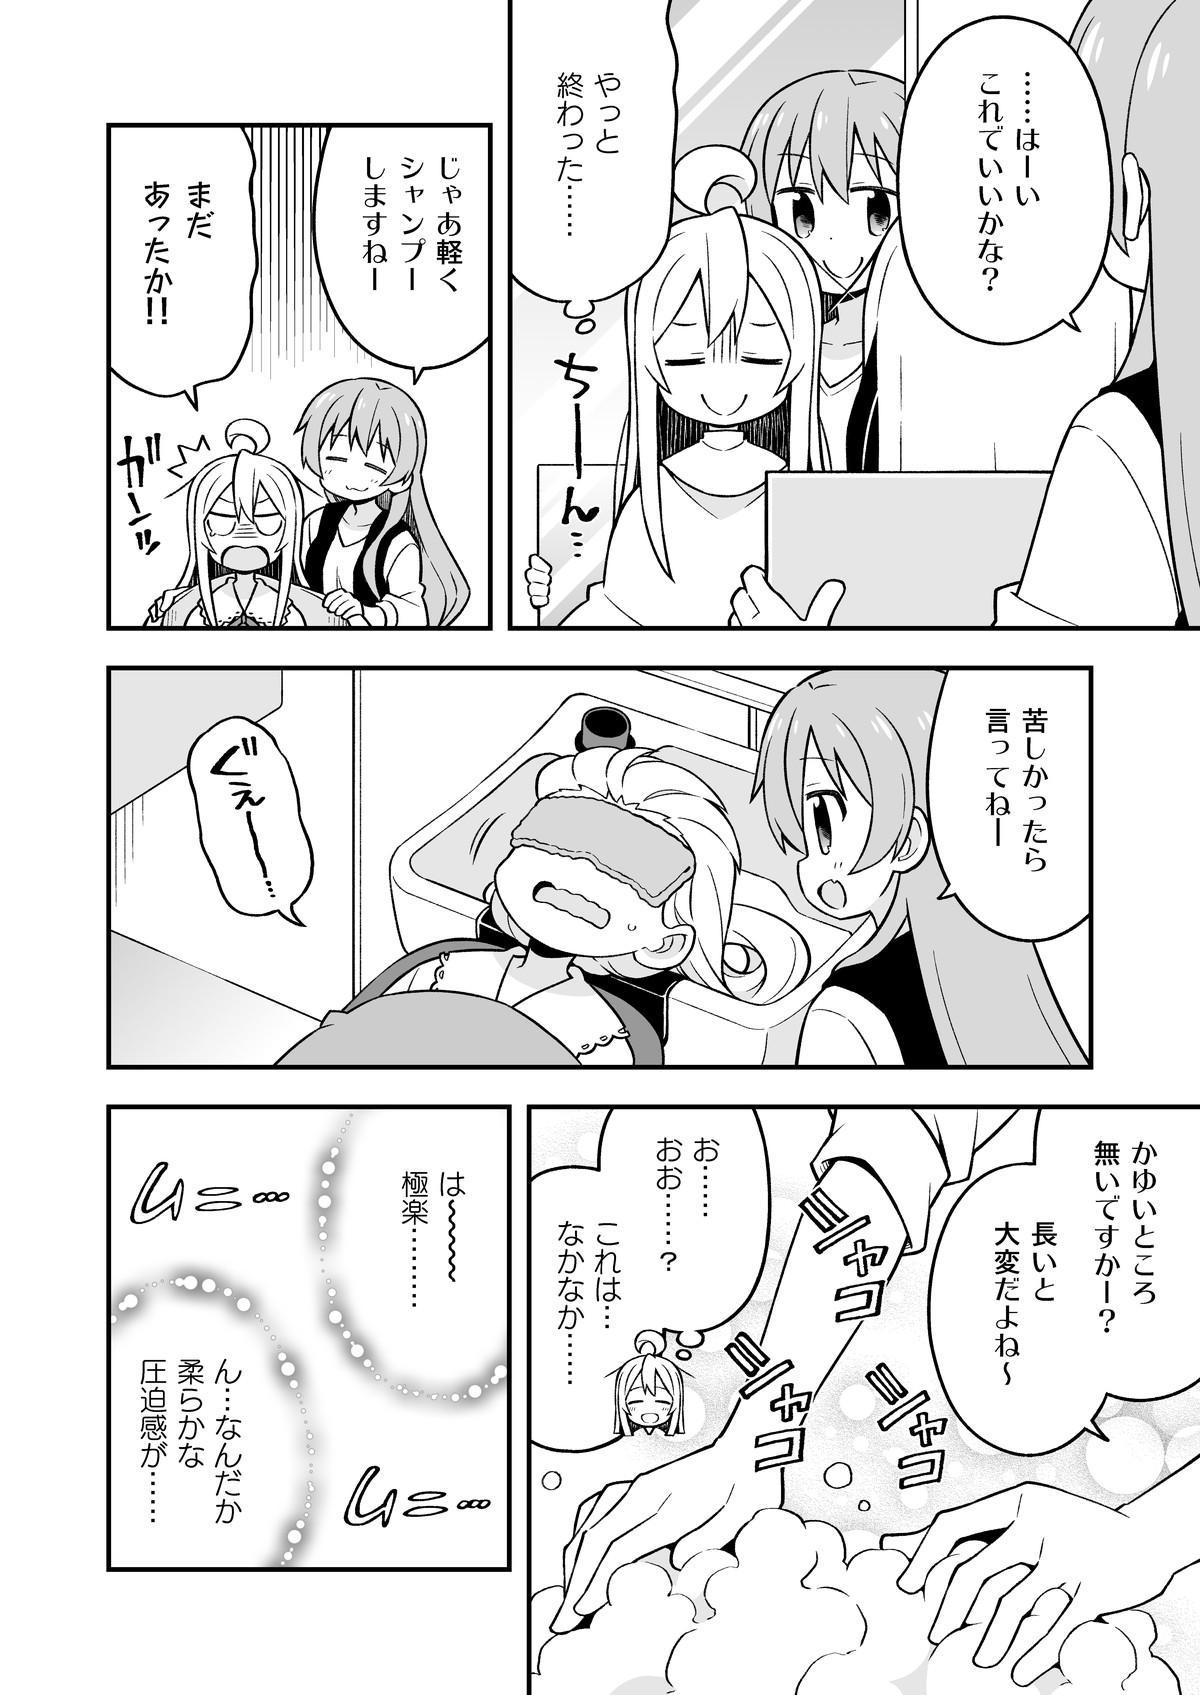 Onii-chan wa Oshimai! 6 6